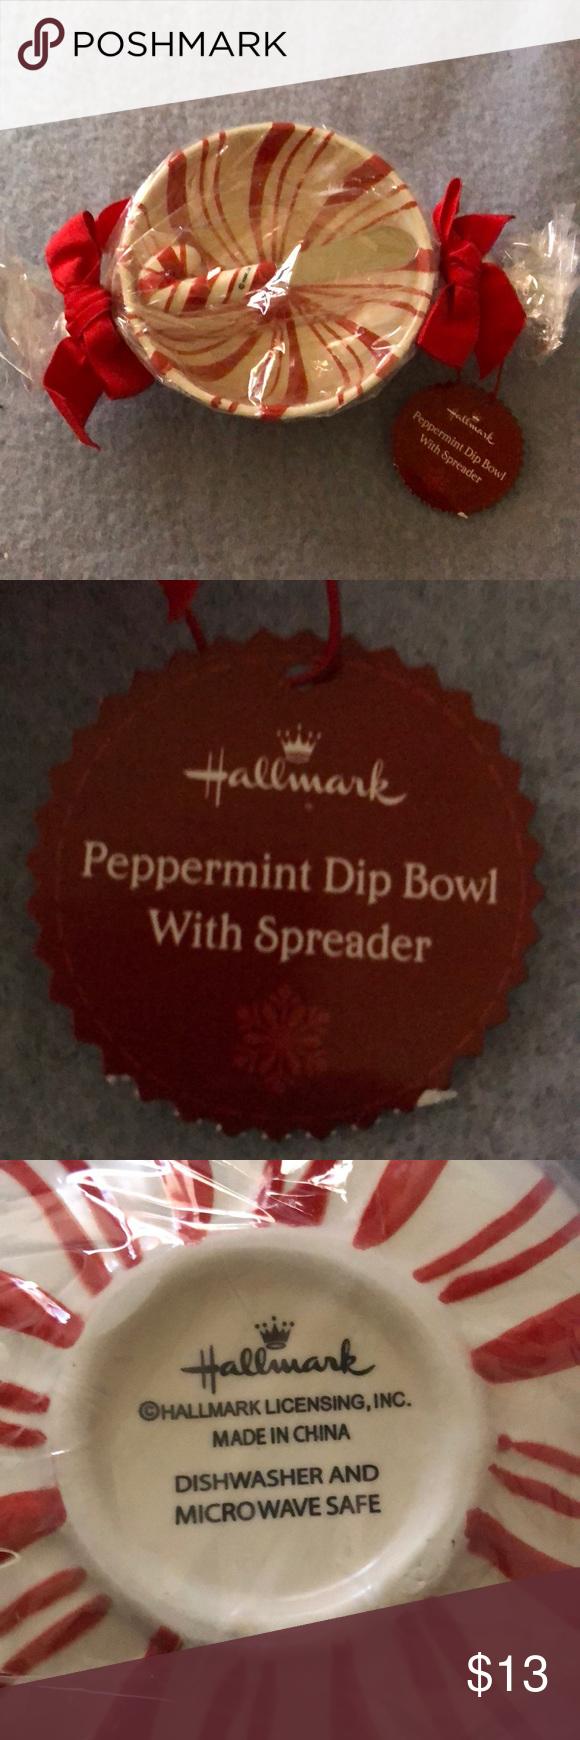 Hallmark Peppermint Dip Bowl & Spreader. NWT Cute